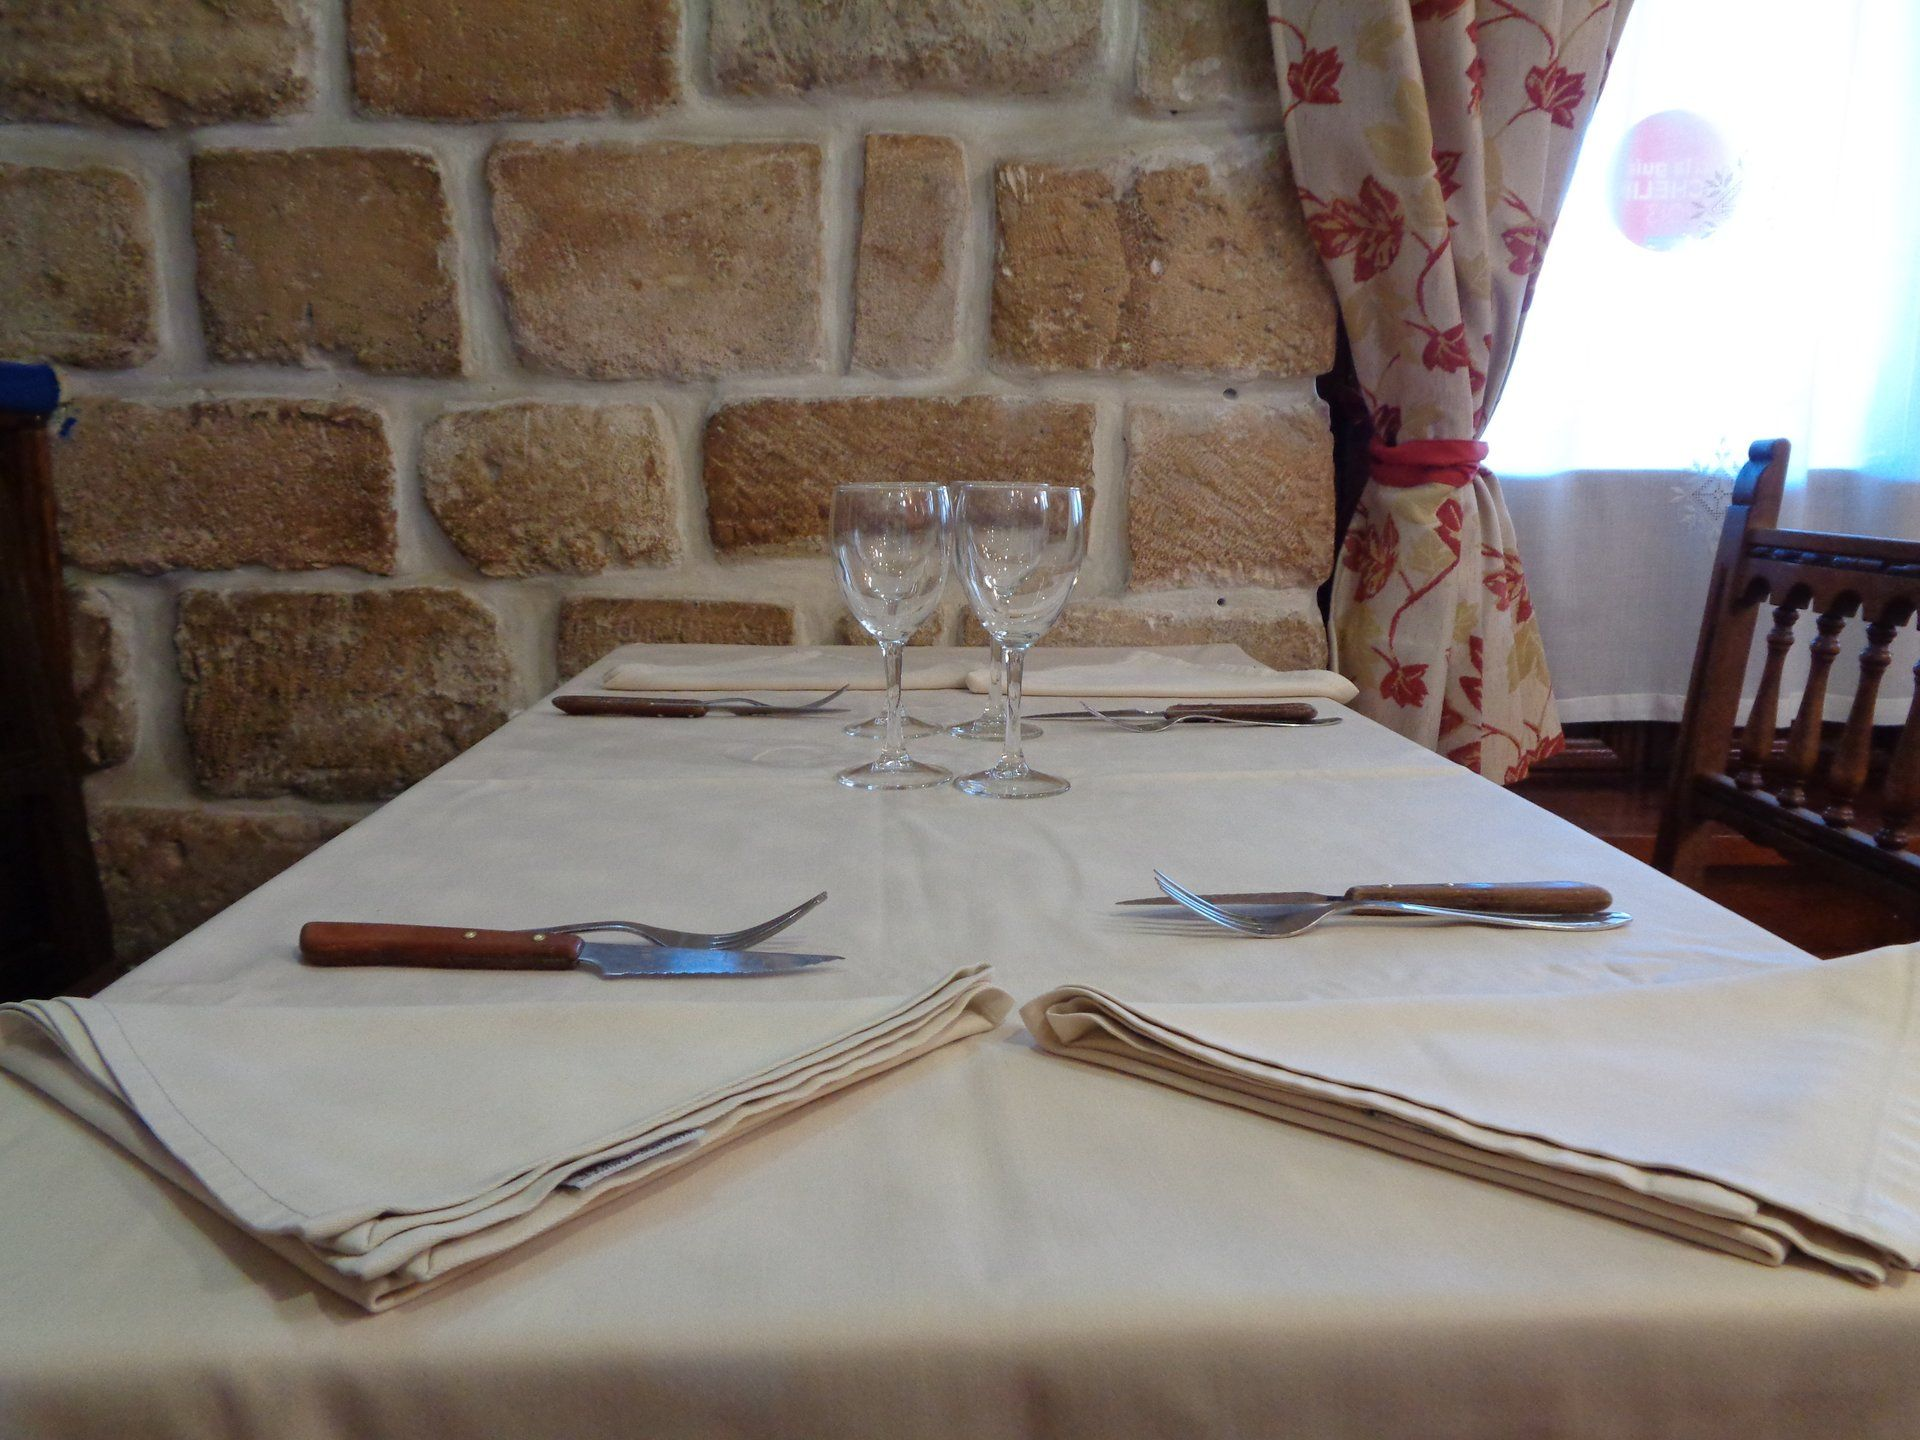 Restaurantes recomendados en Riaza